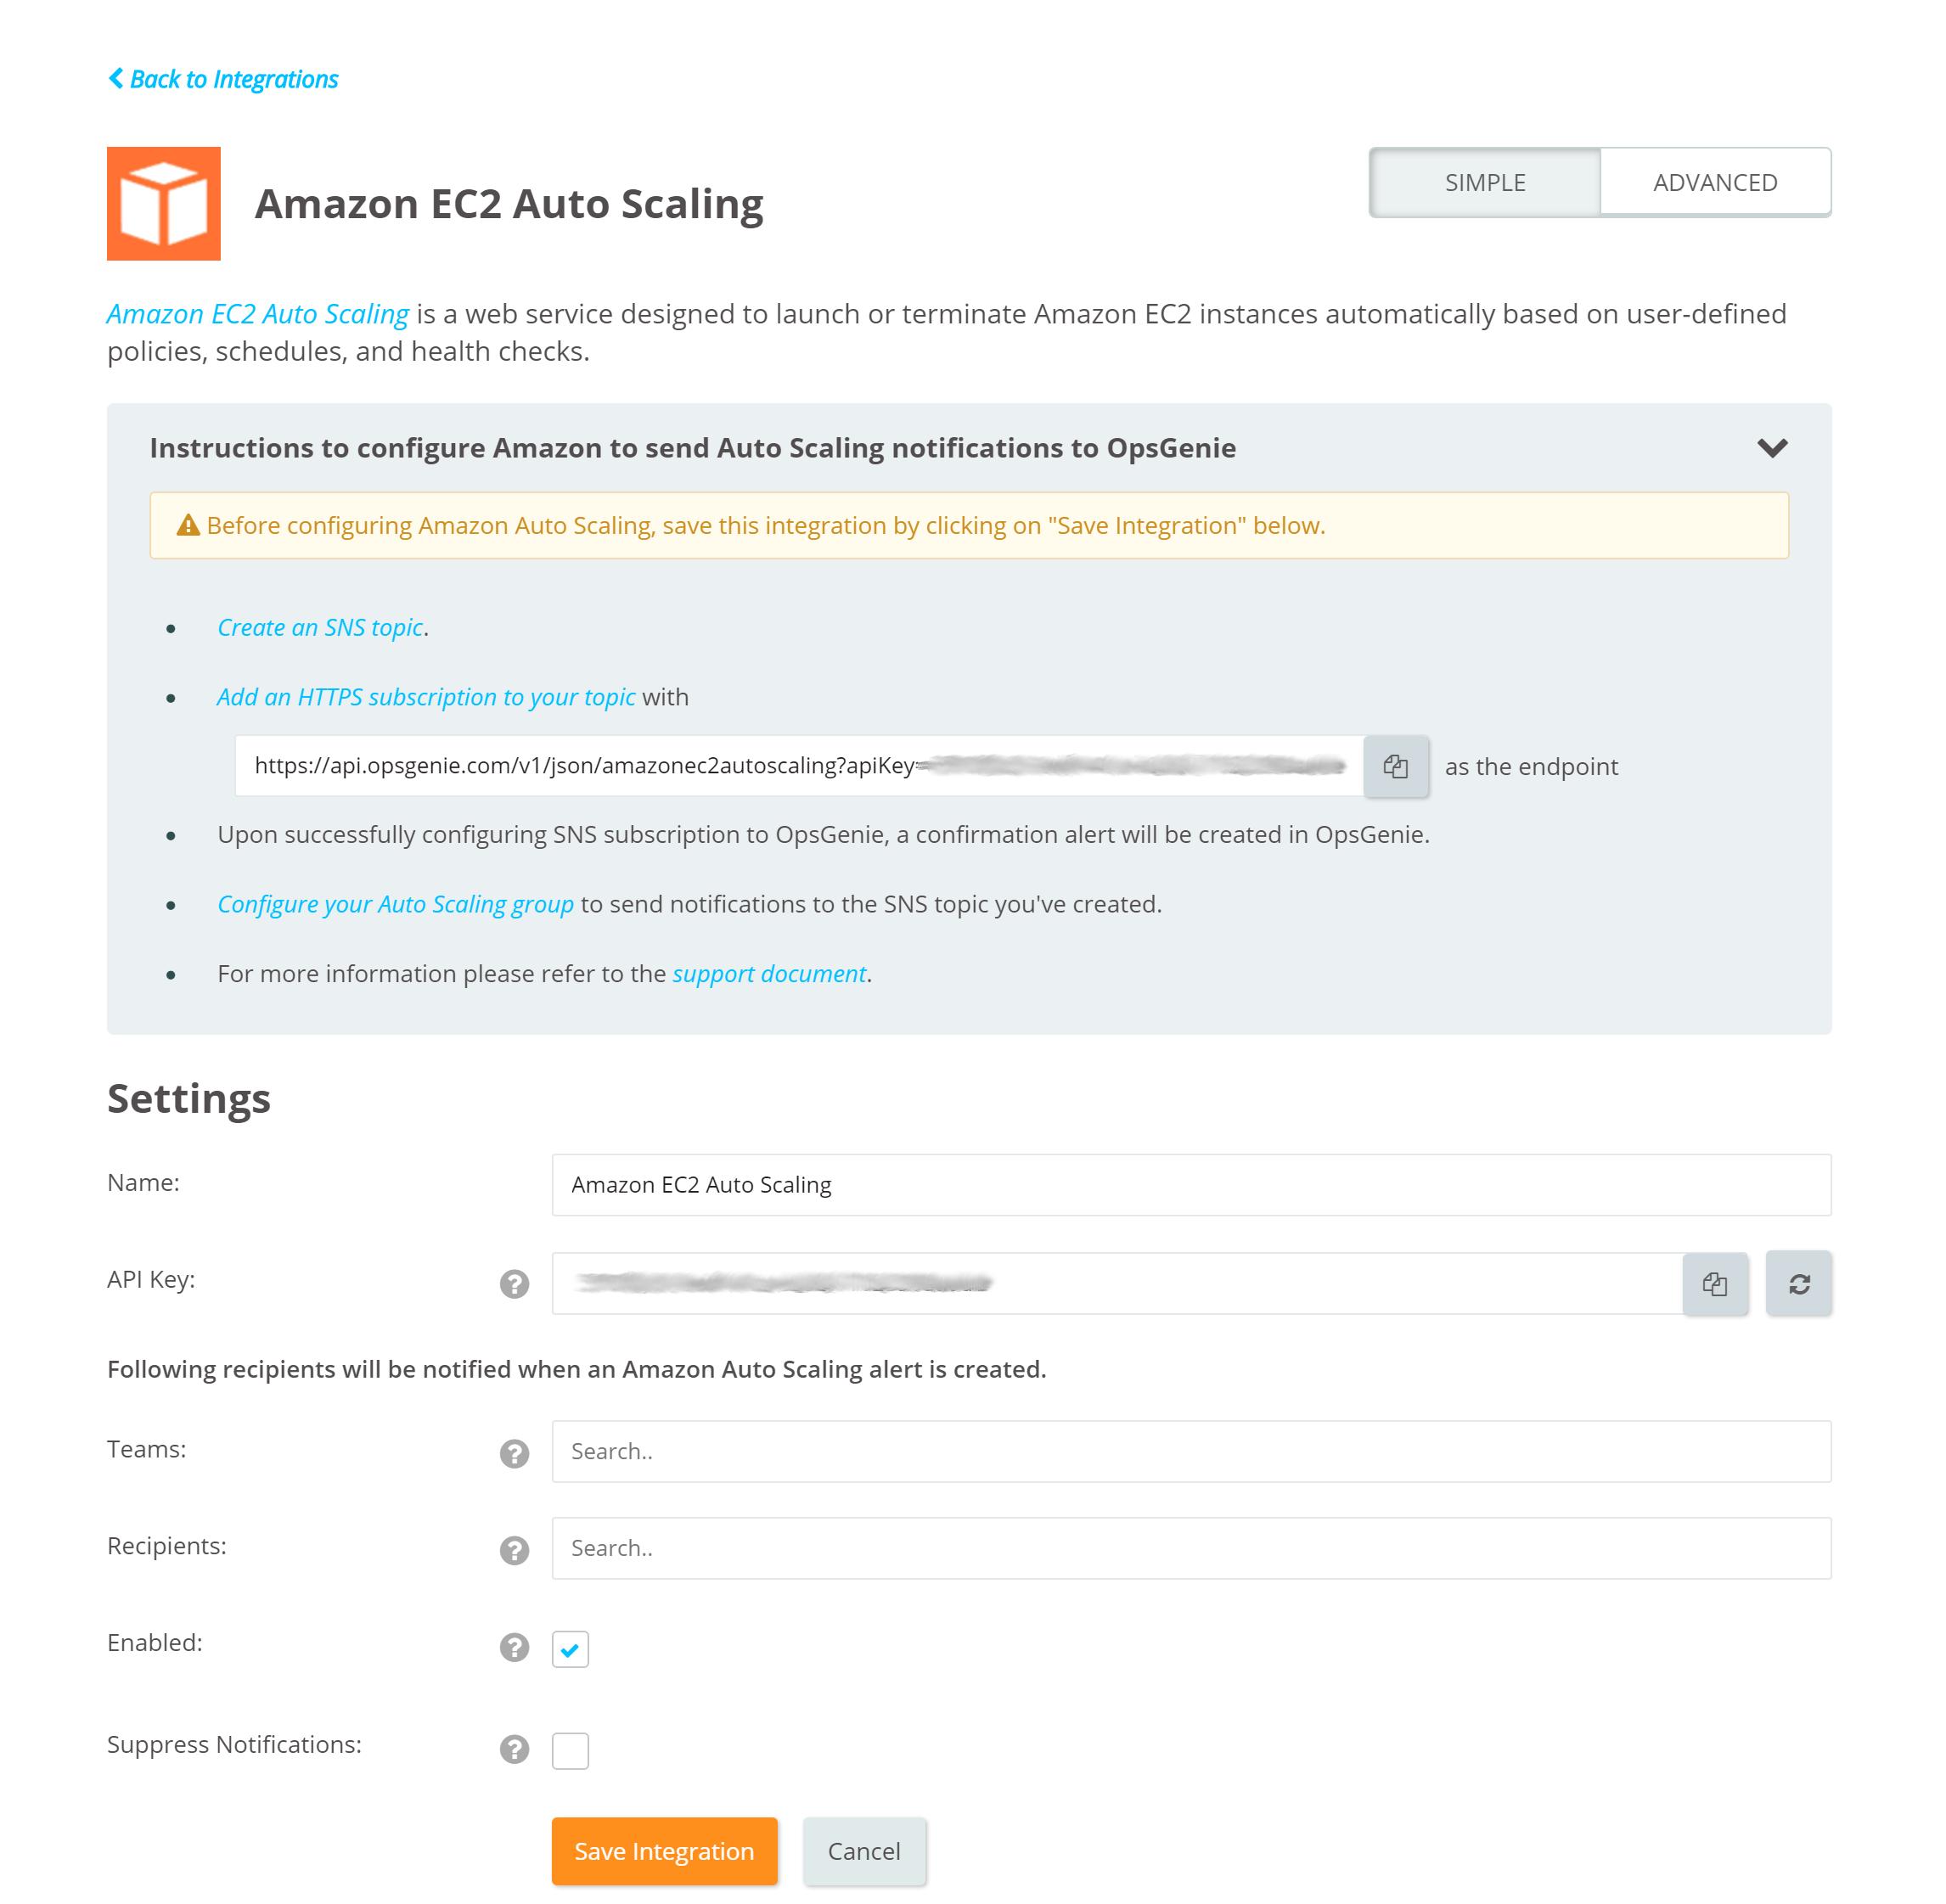 Amazon EC2 Auto Scaling Integration